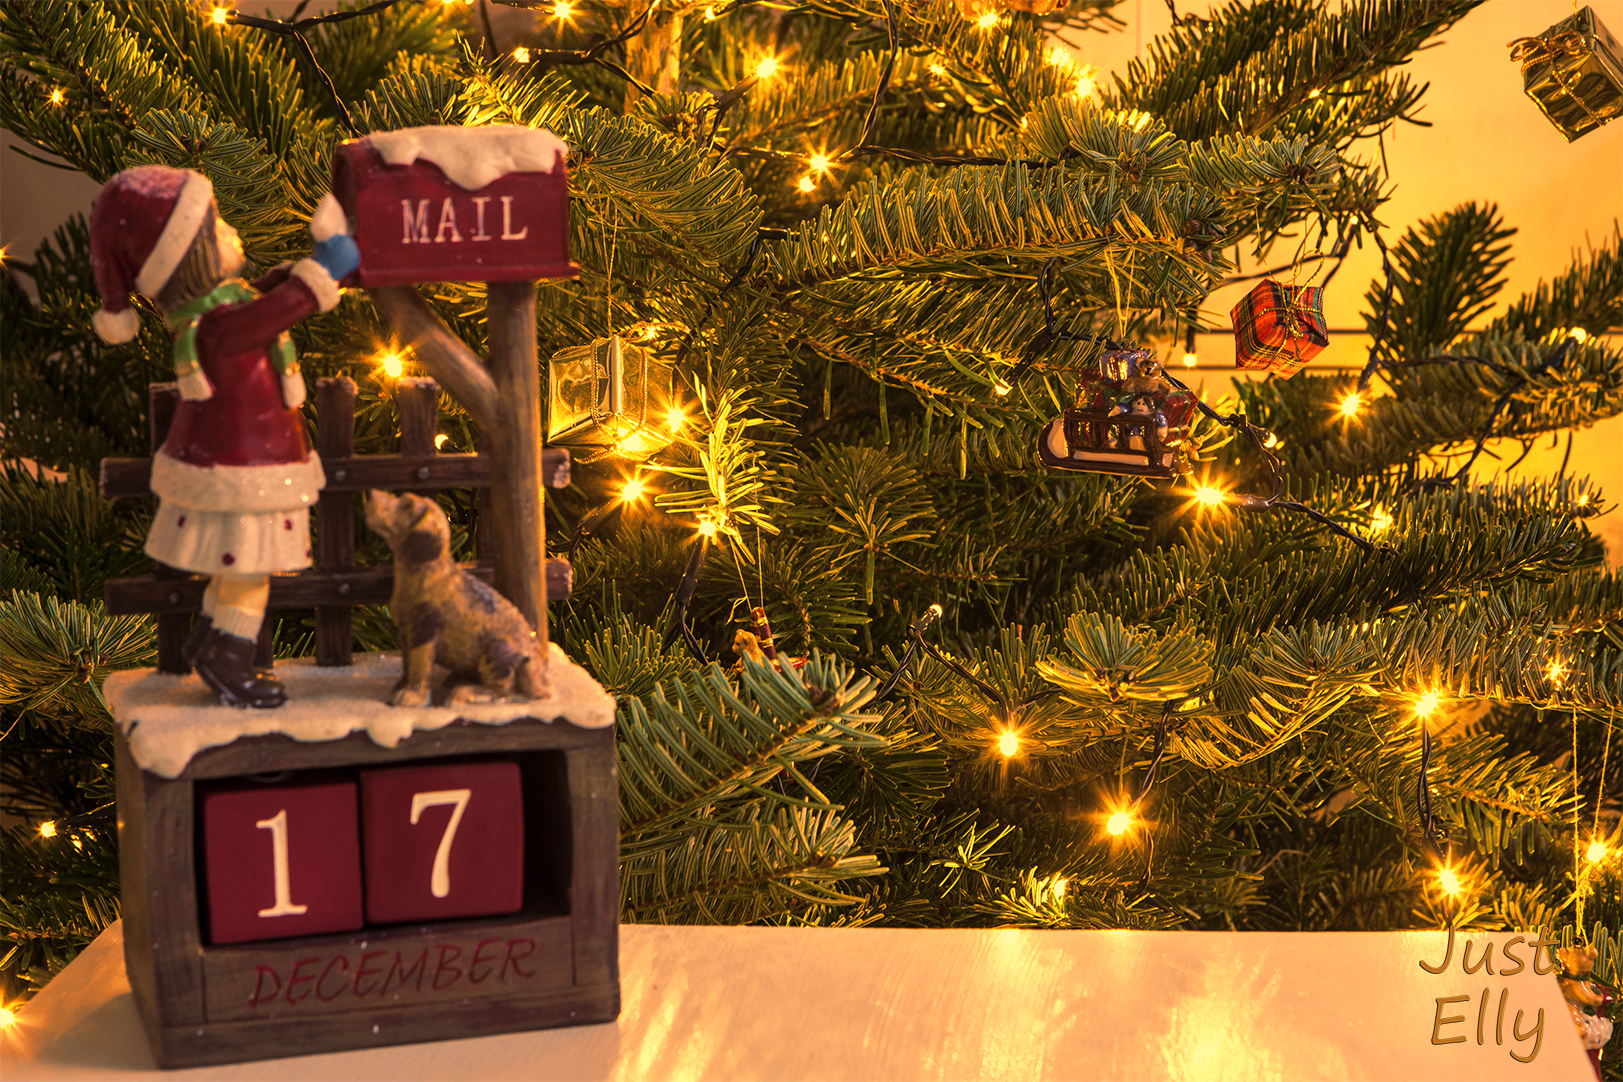 December 17th - My advent calendar